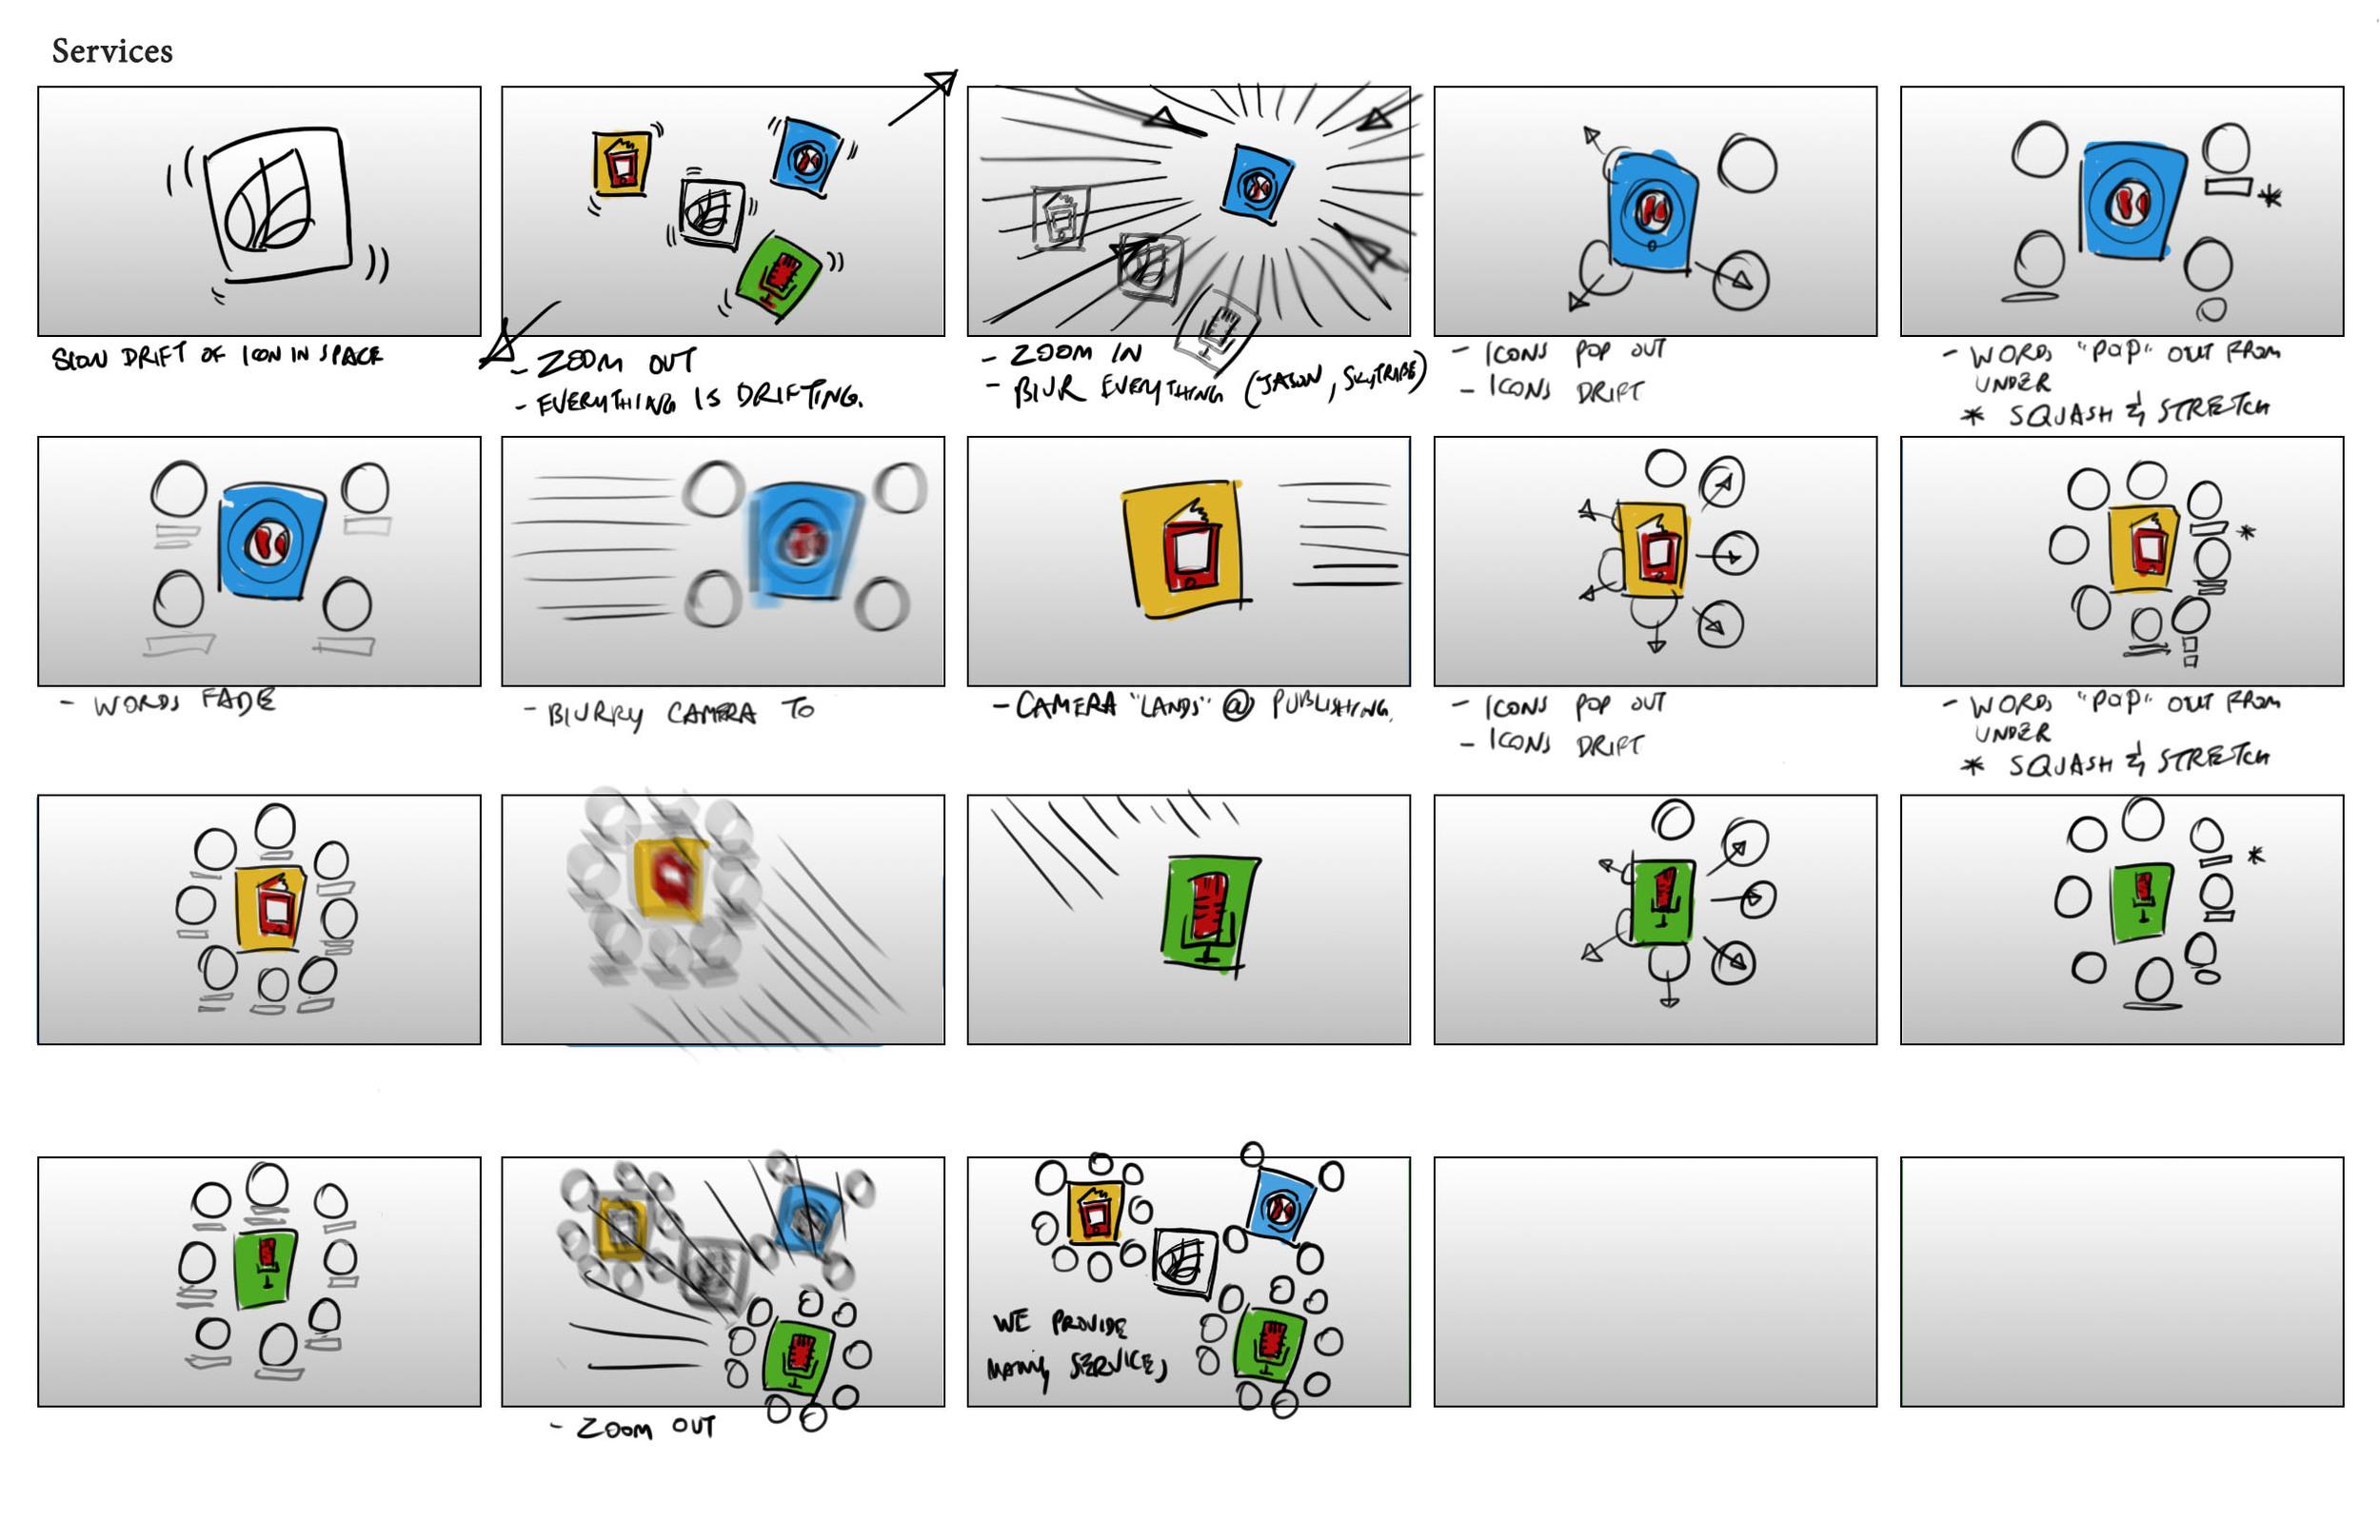 China Joy storyboards_Ver2 - services.jpg